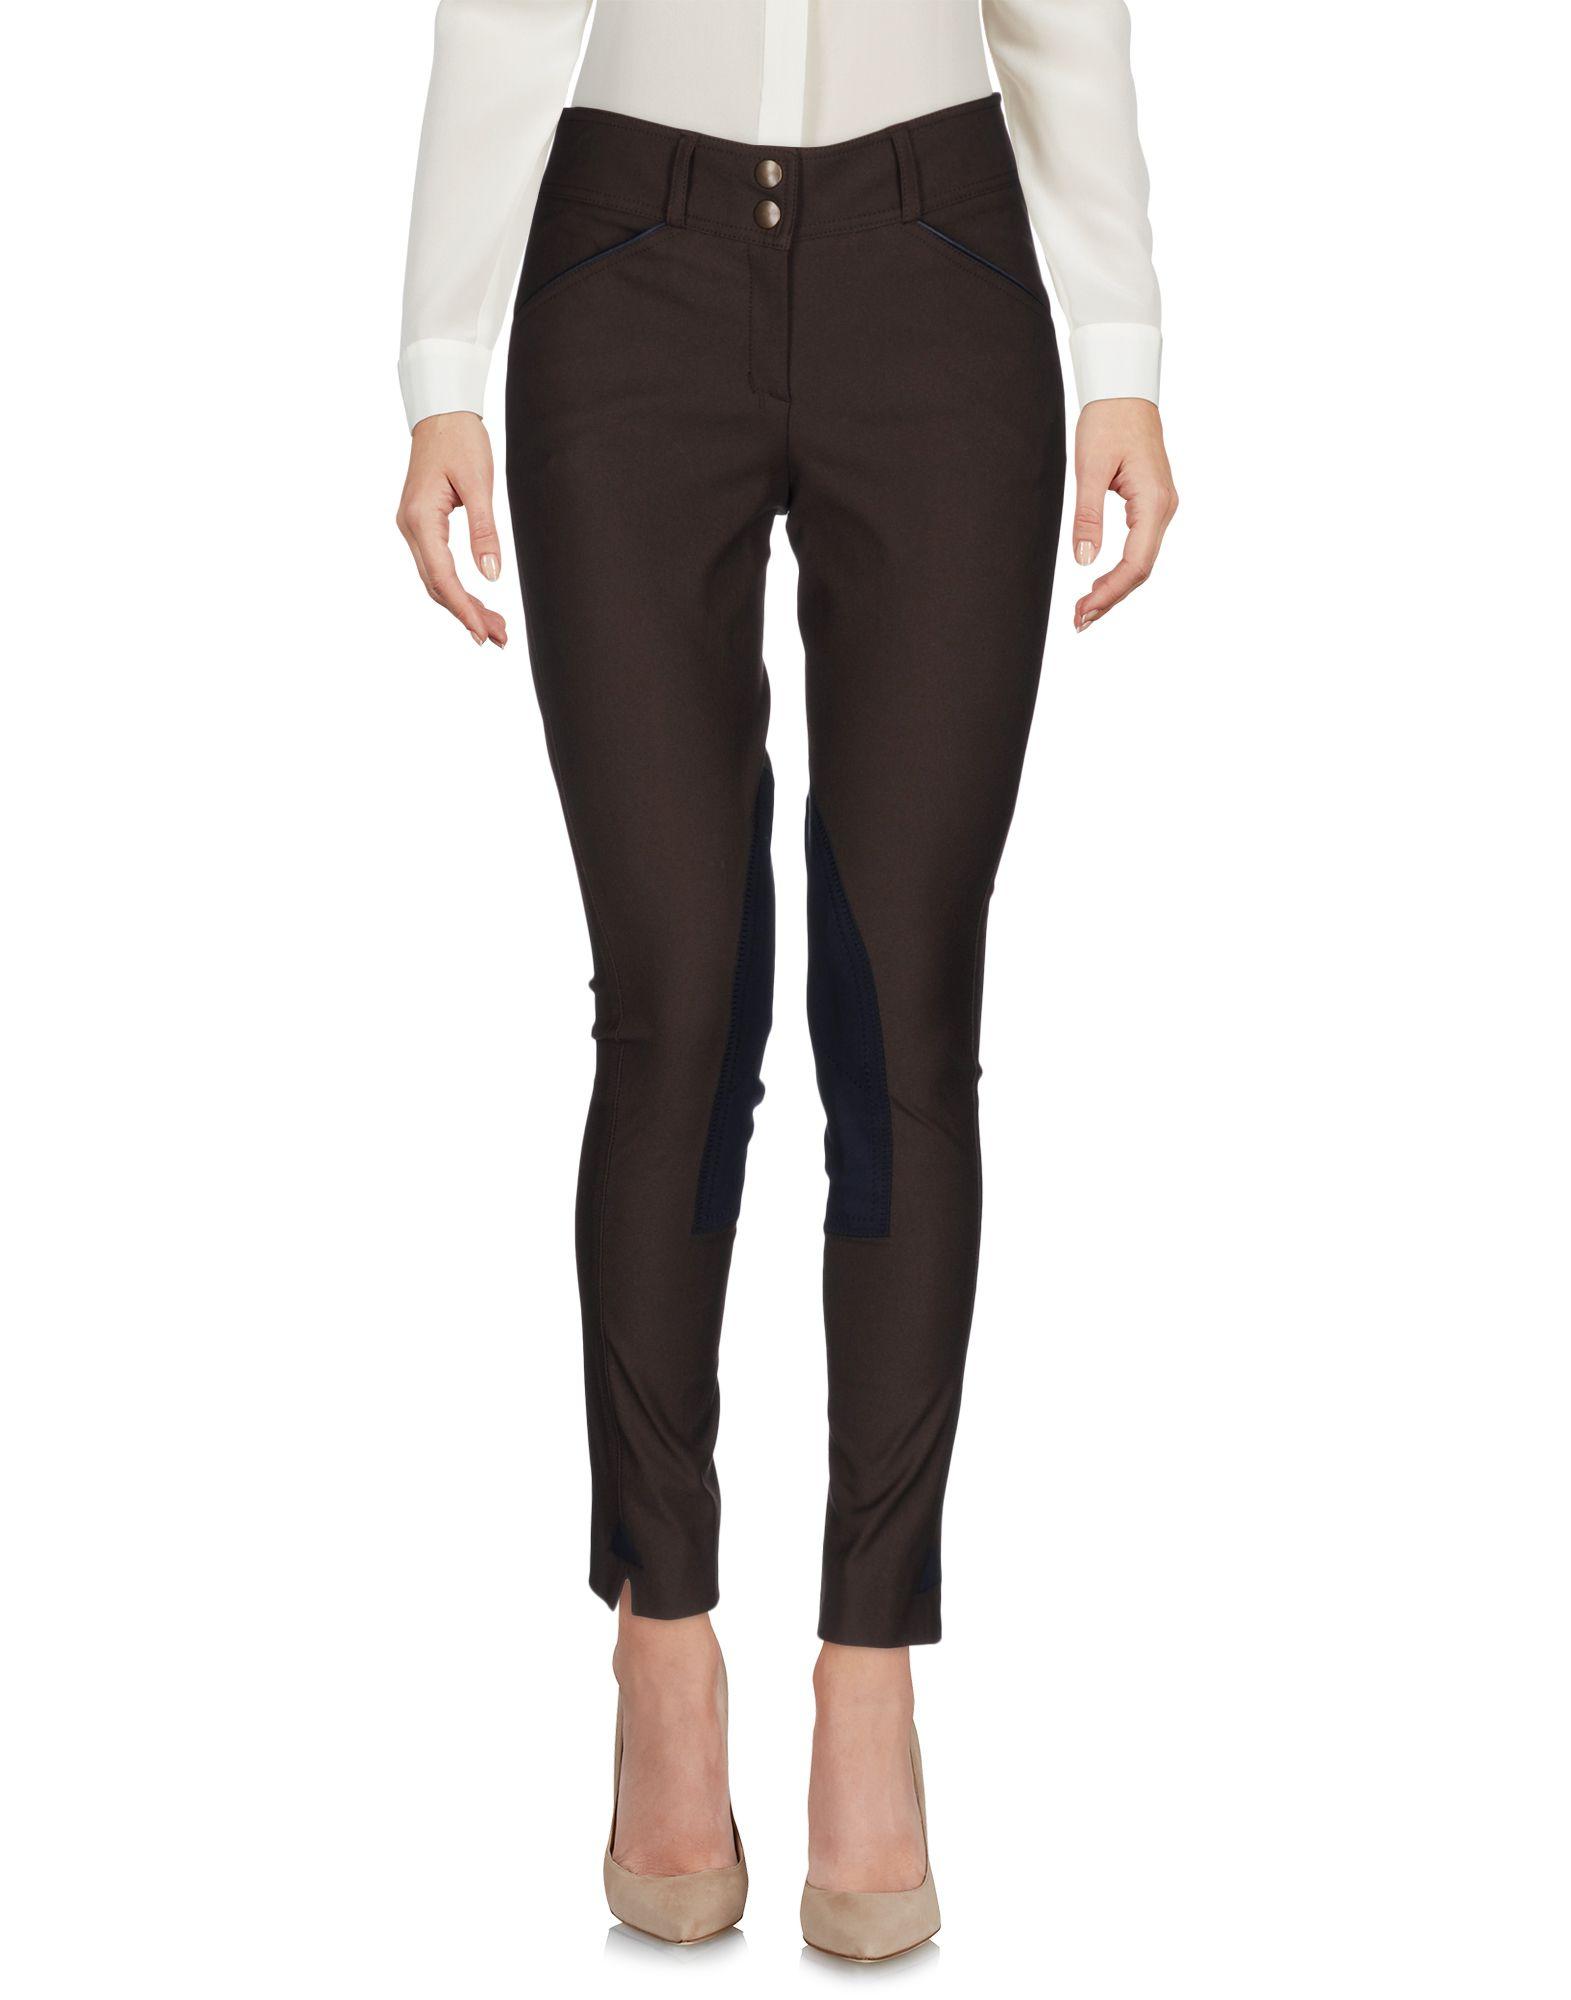 HERITAGE Damen Hose Farbe Khaki Größe 3